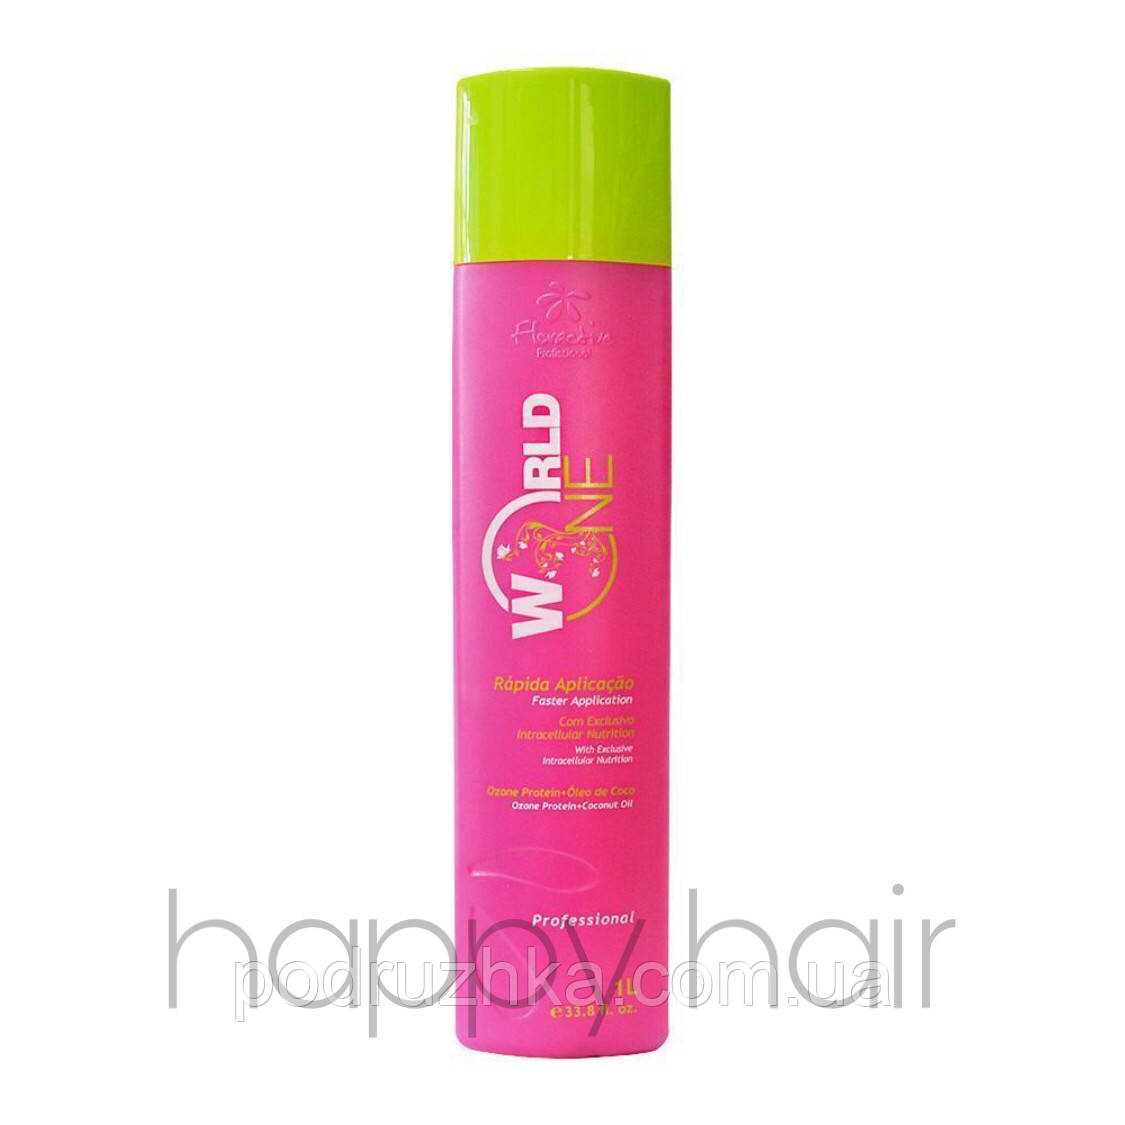 Нанопластика для волос Floractive W.One 1000 г